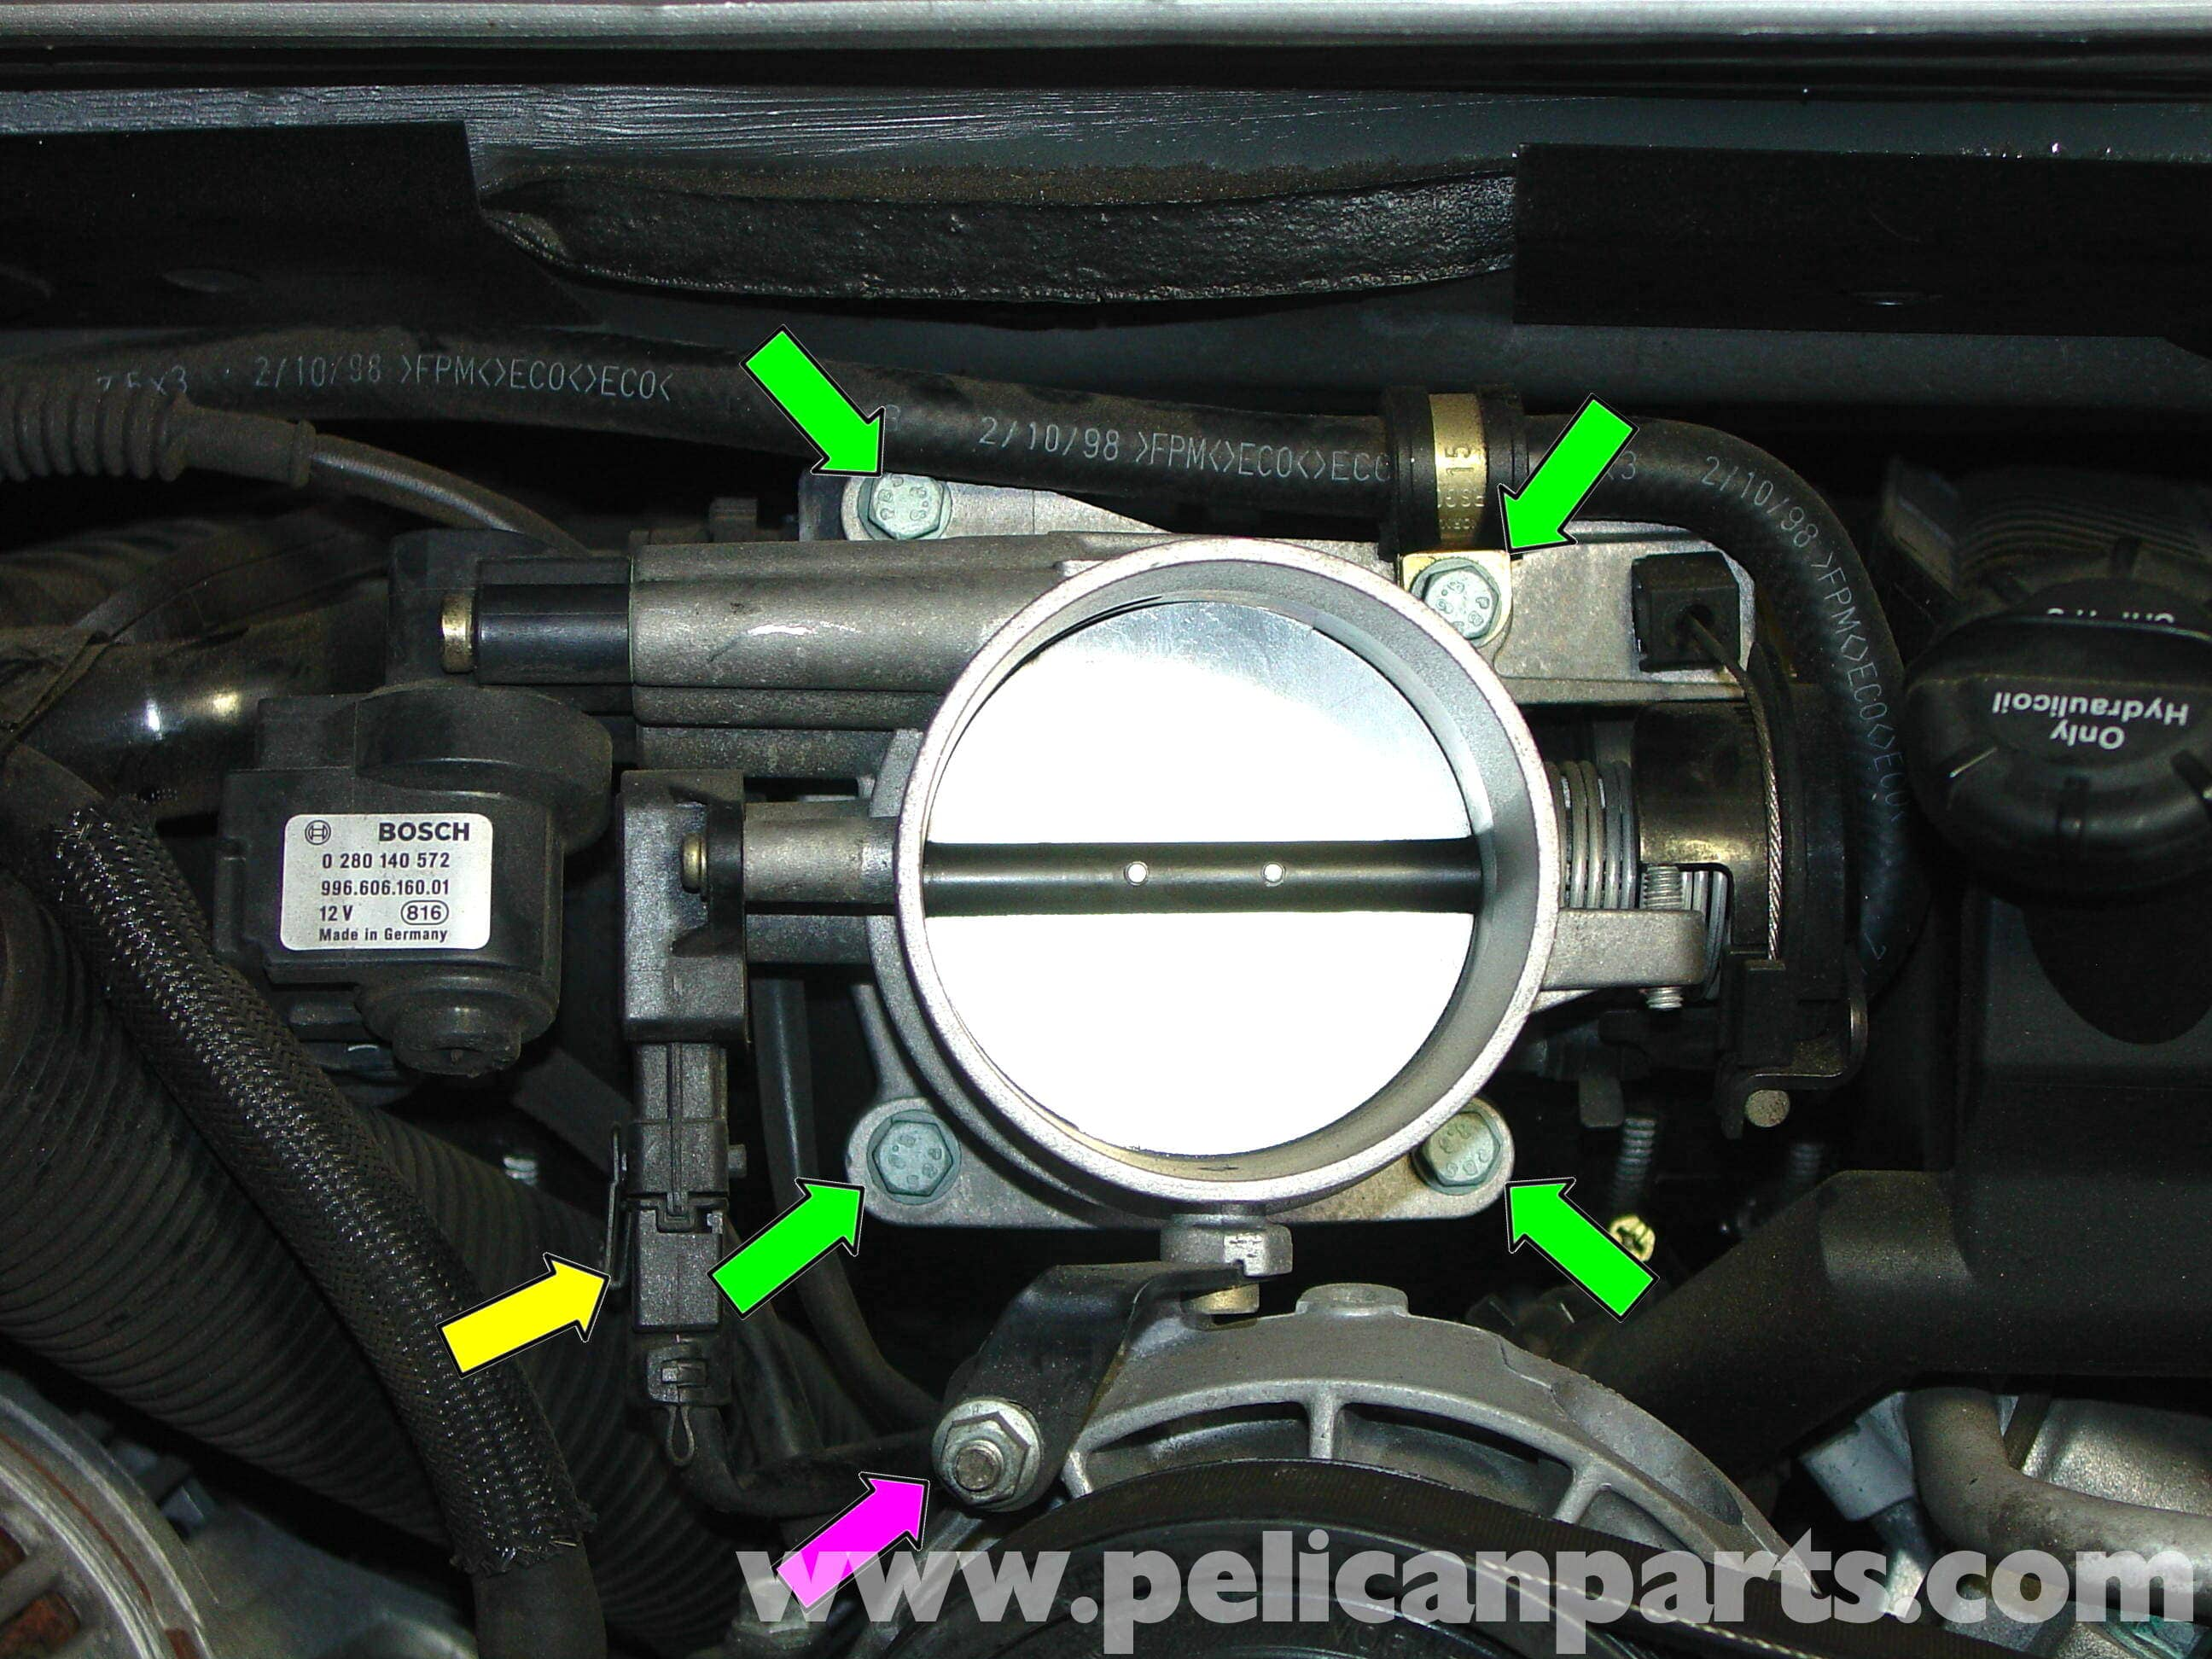 Porsche 911 Starter Wiring Diagram Just Another Blog Of 1987 Engine Carrera Replacement 996 1998 2005 997 Rh Pelicanparts Com 1975 Safety